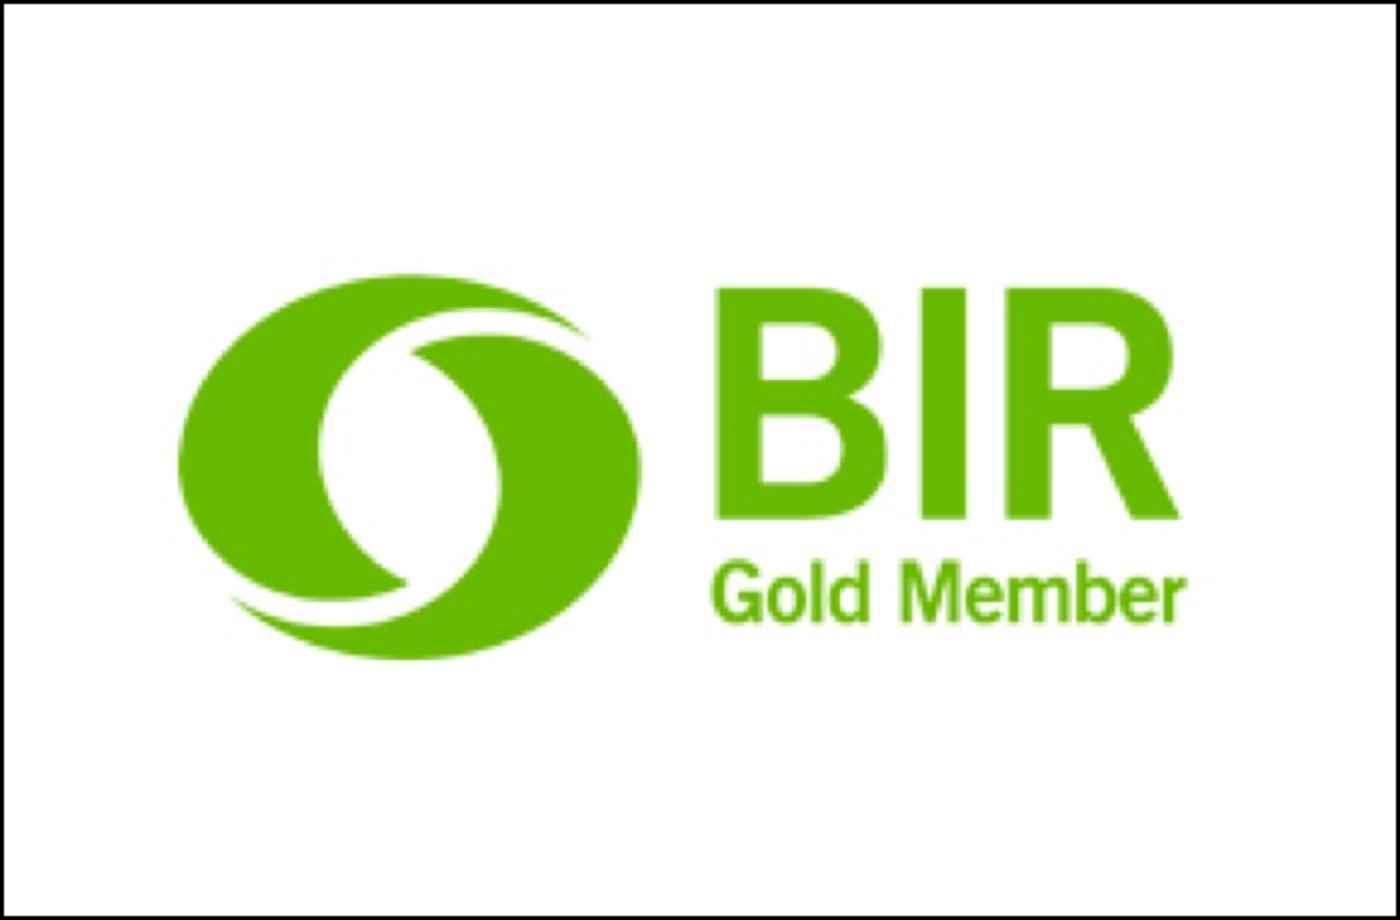 mairec edelmetall precious metal recycling mitgliedschaft bir gold member membership